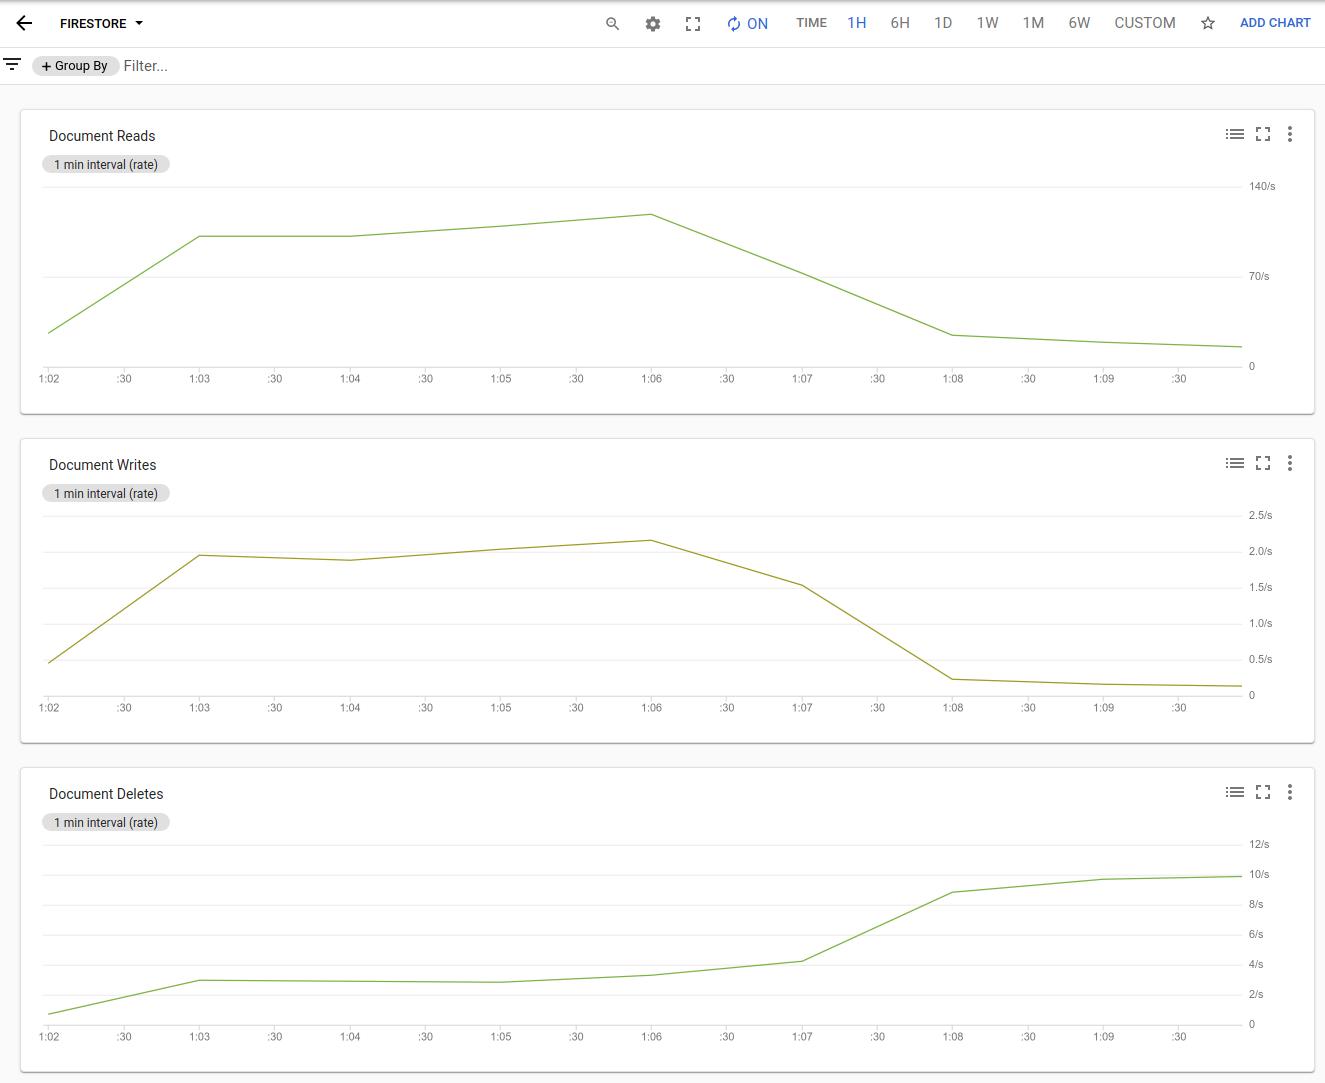 Cloud Monitoring 대시보드의 Cloud Firestore 사용량